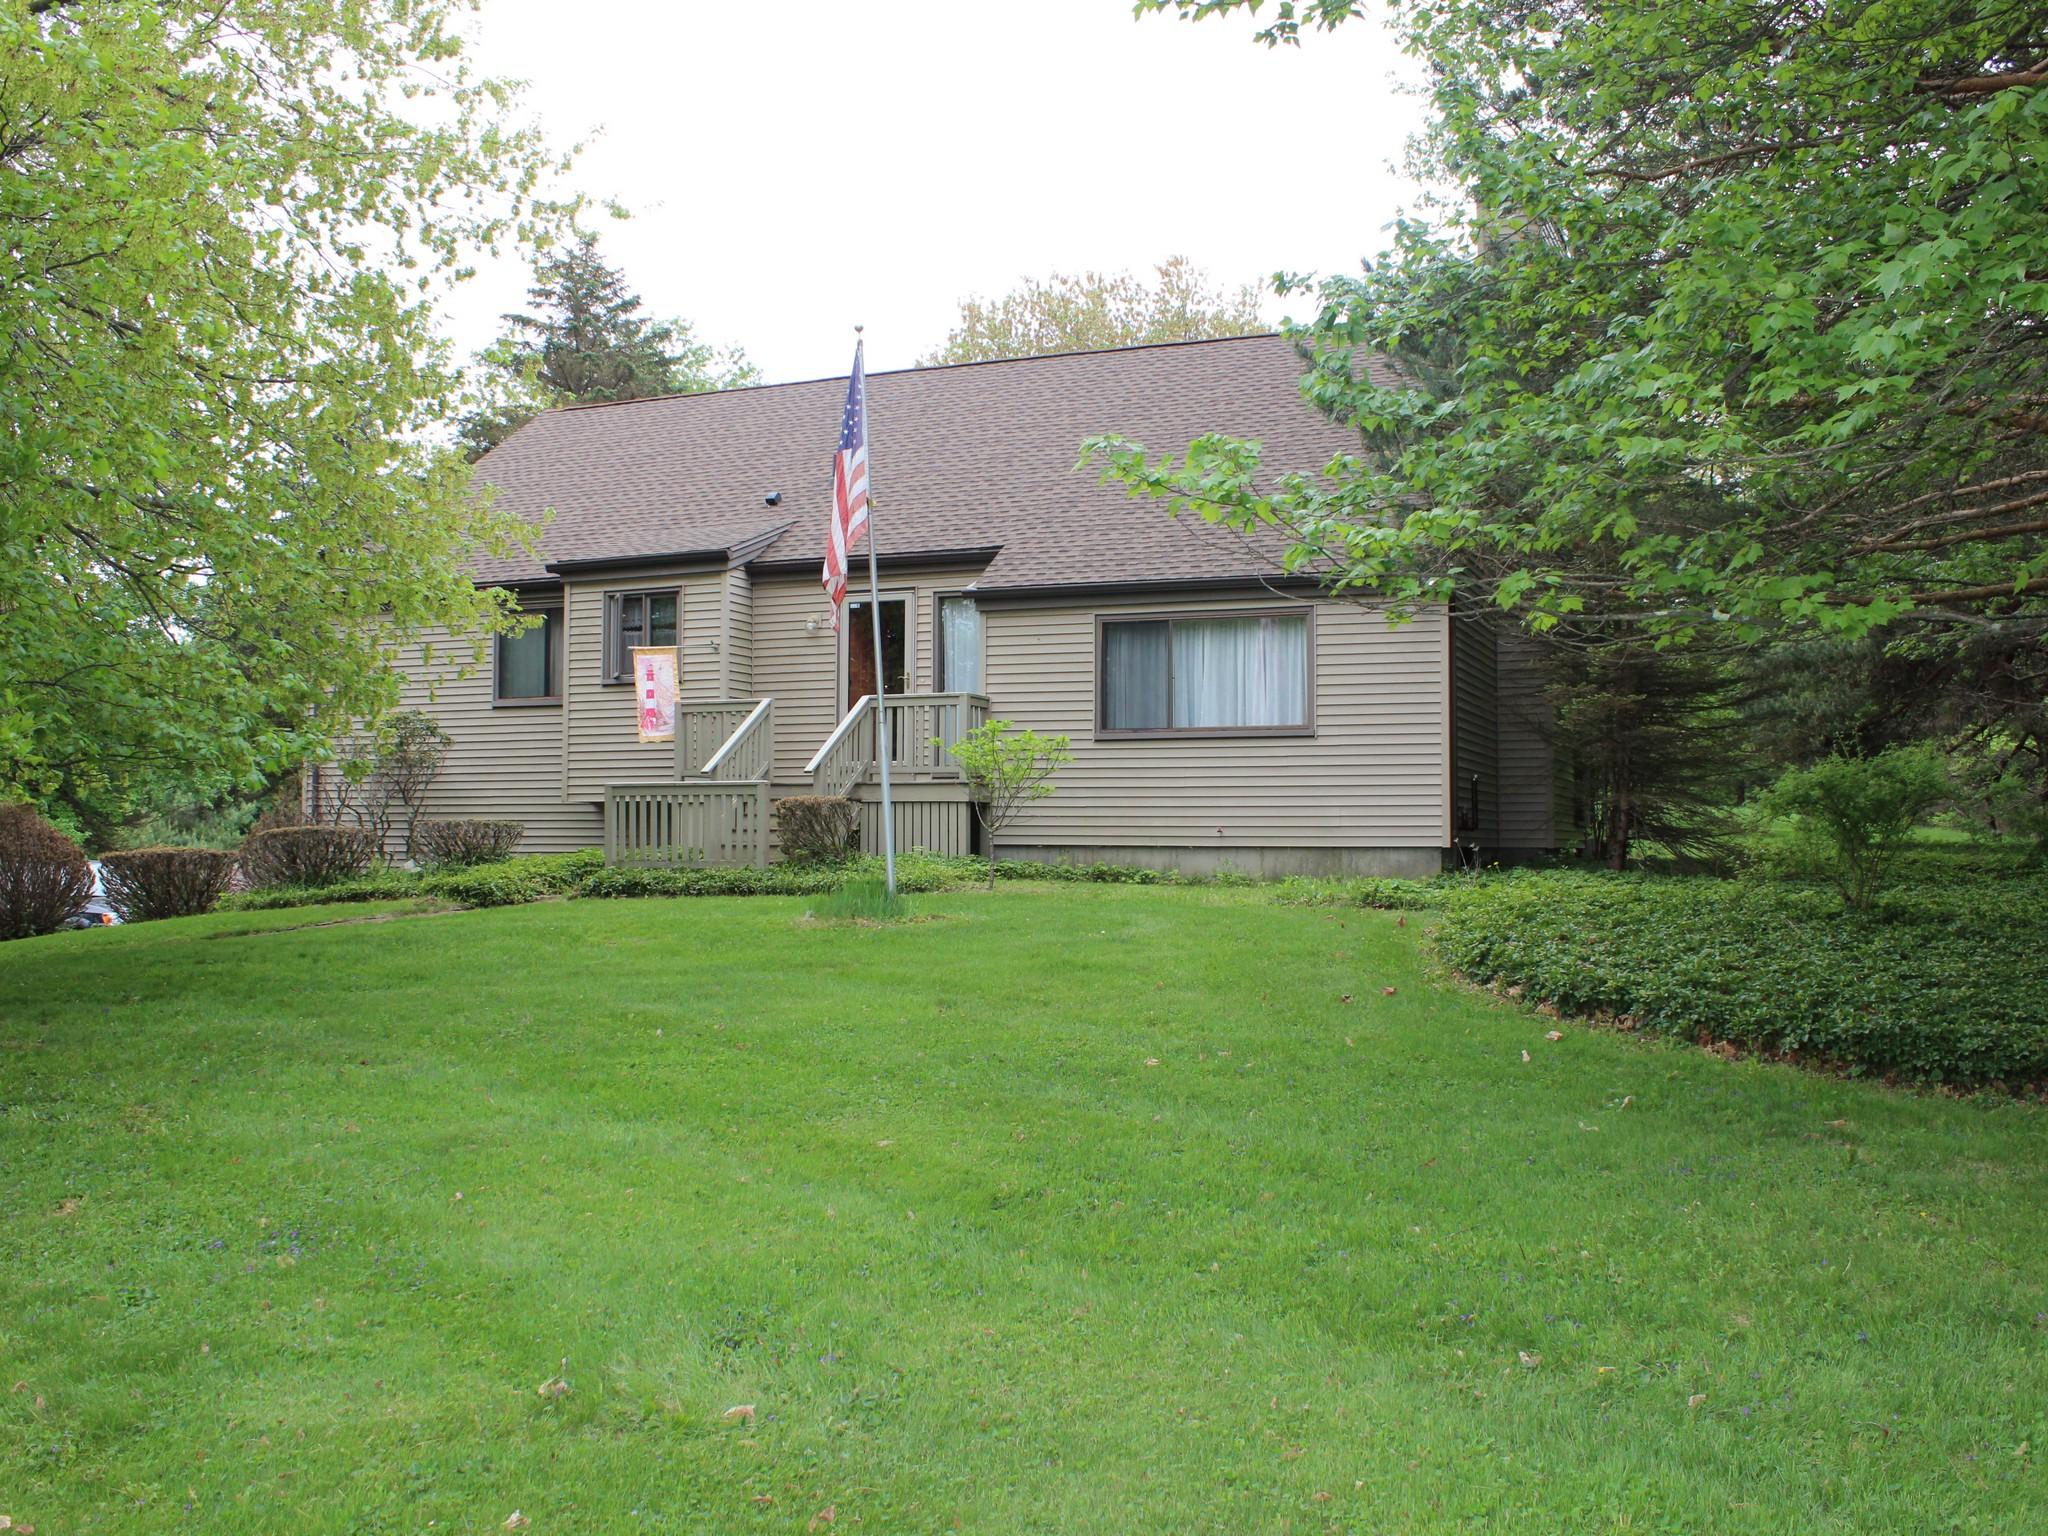 Casa Unifamiliar por un Venta en Morris Country Cape 315 Lakeside Rd Morris, Connecticut 06763 Estados Unidos